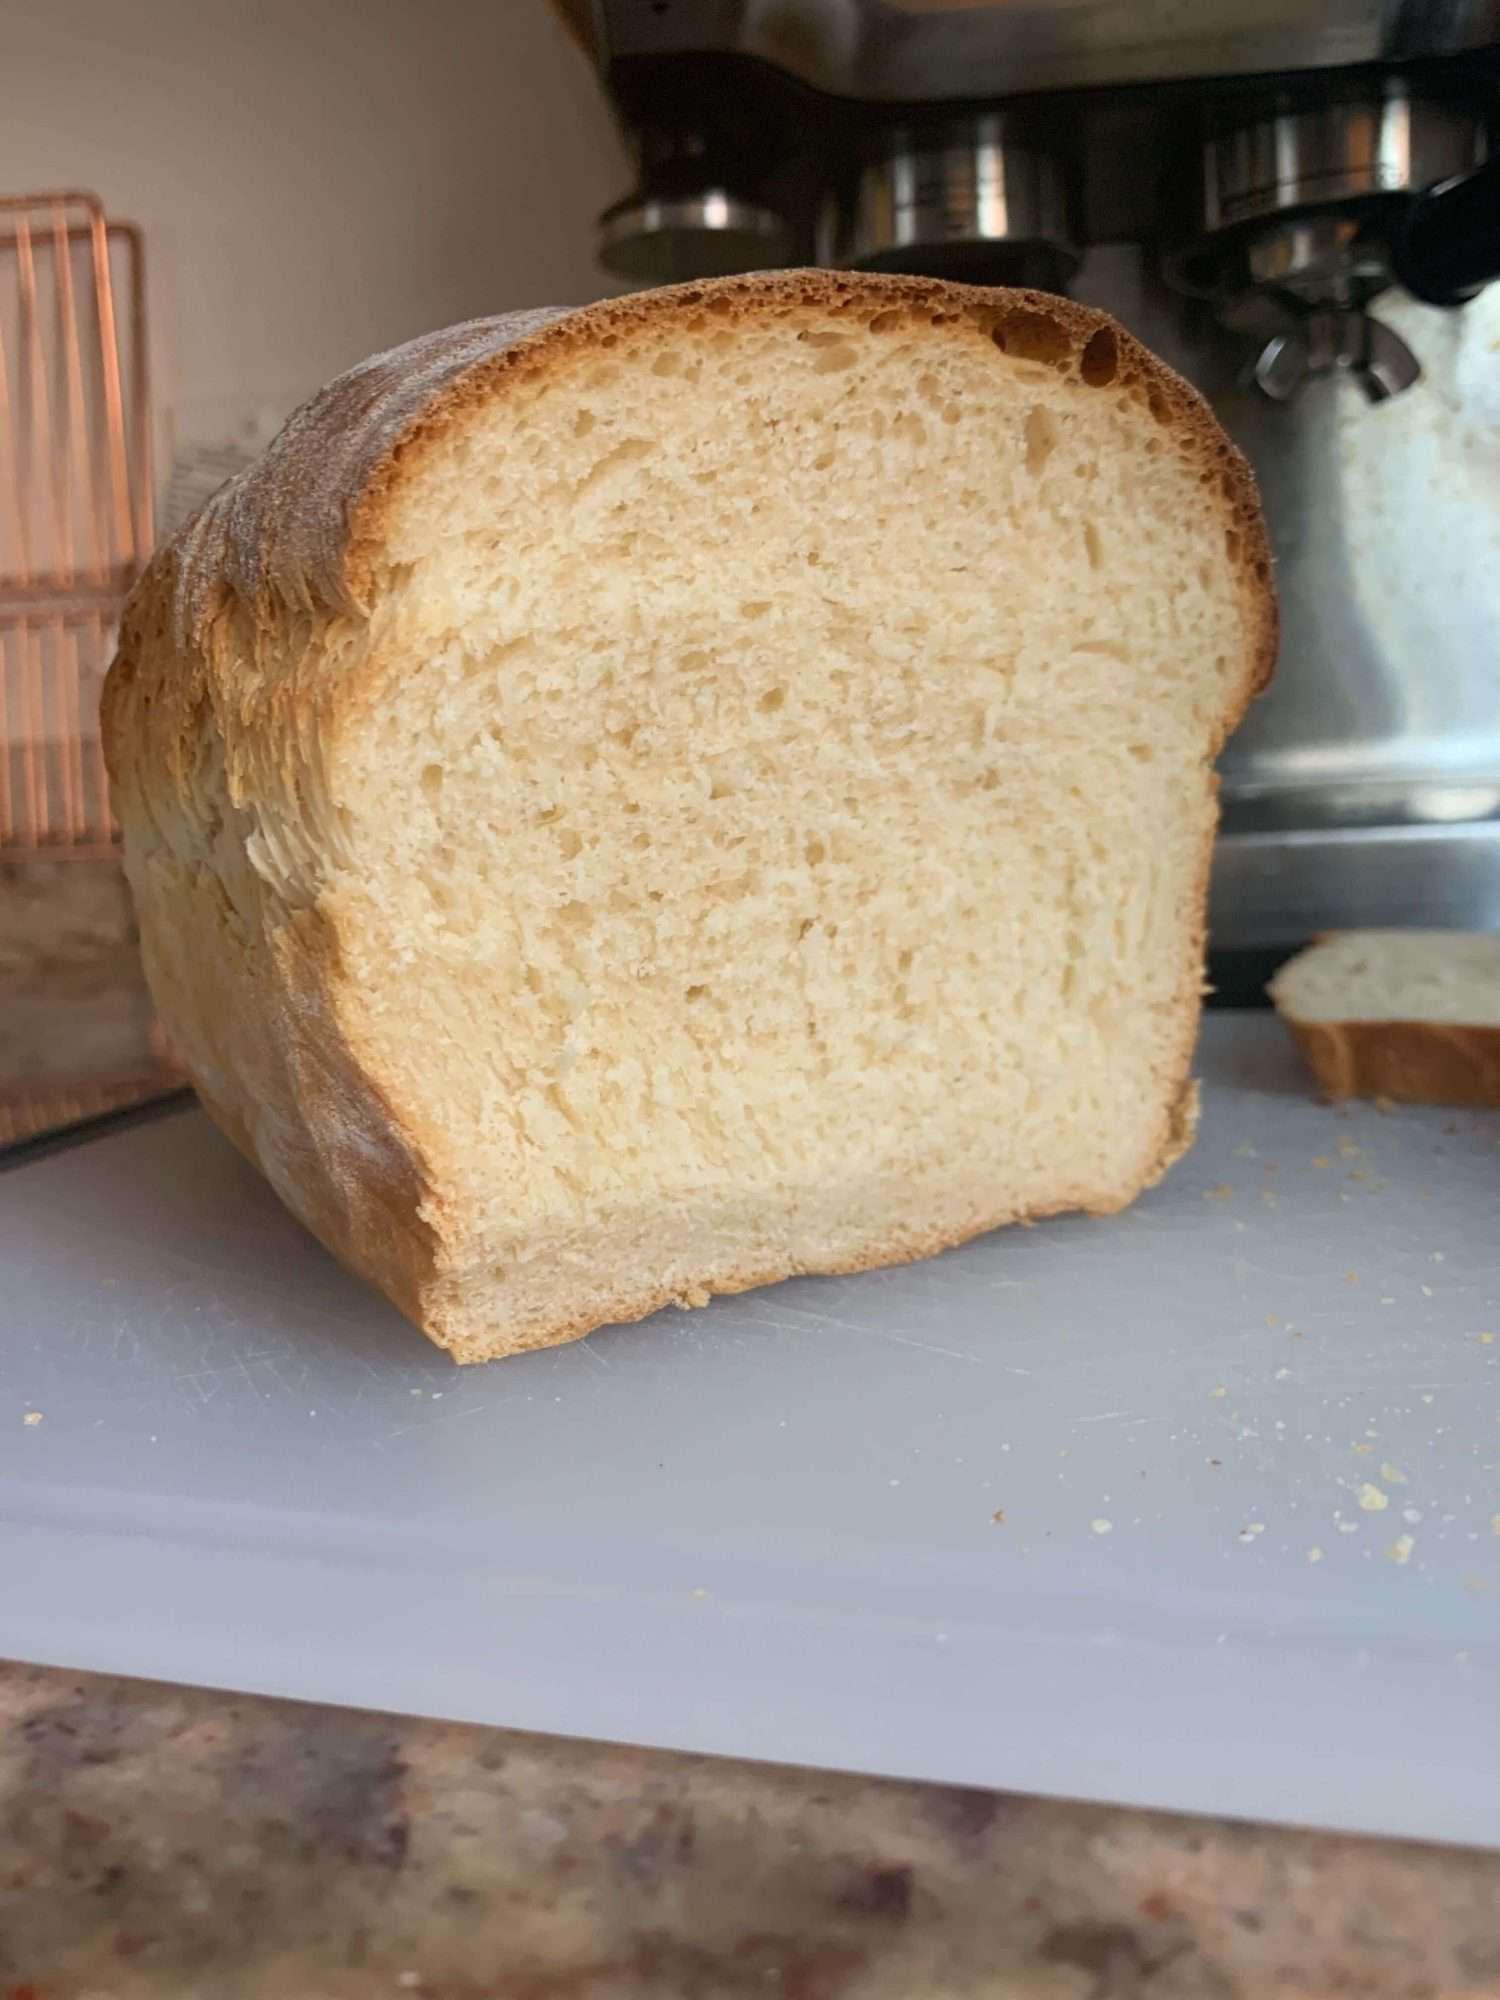 Crumb shot of homemade wonderbread